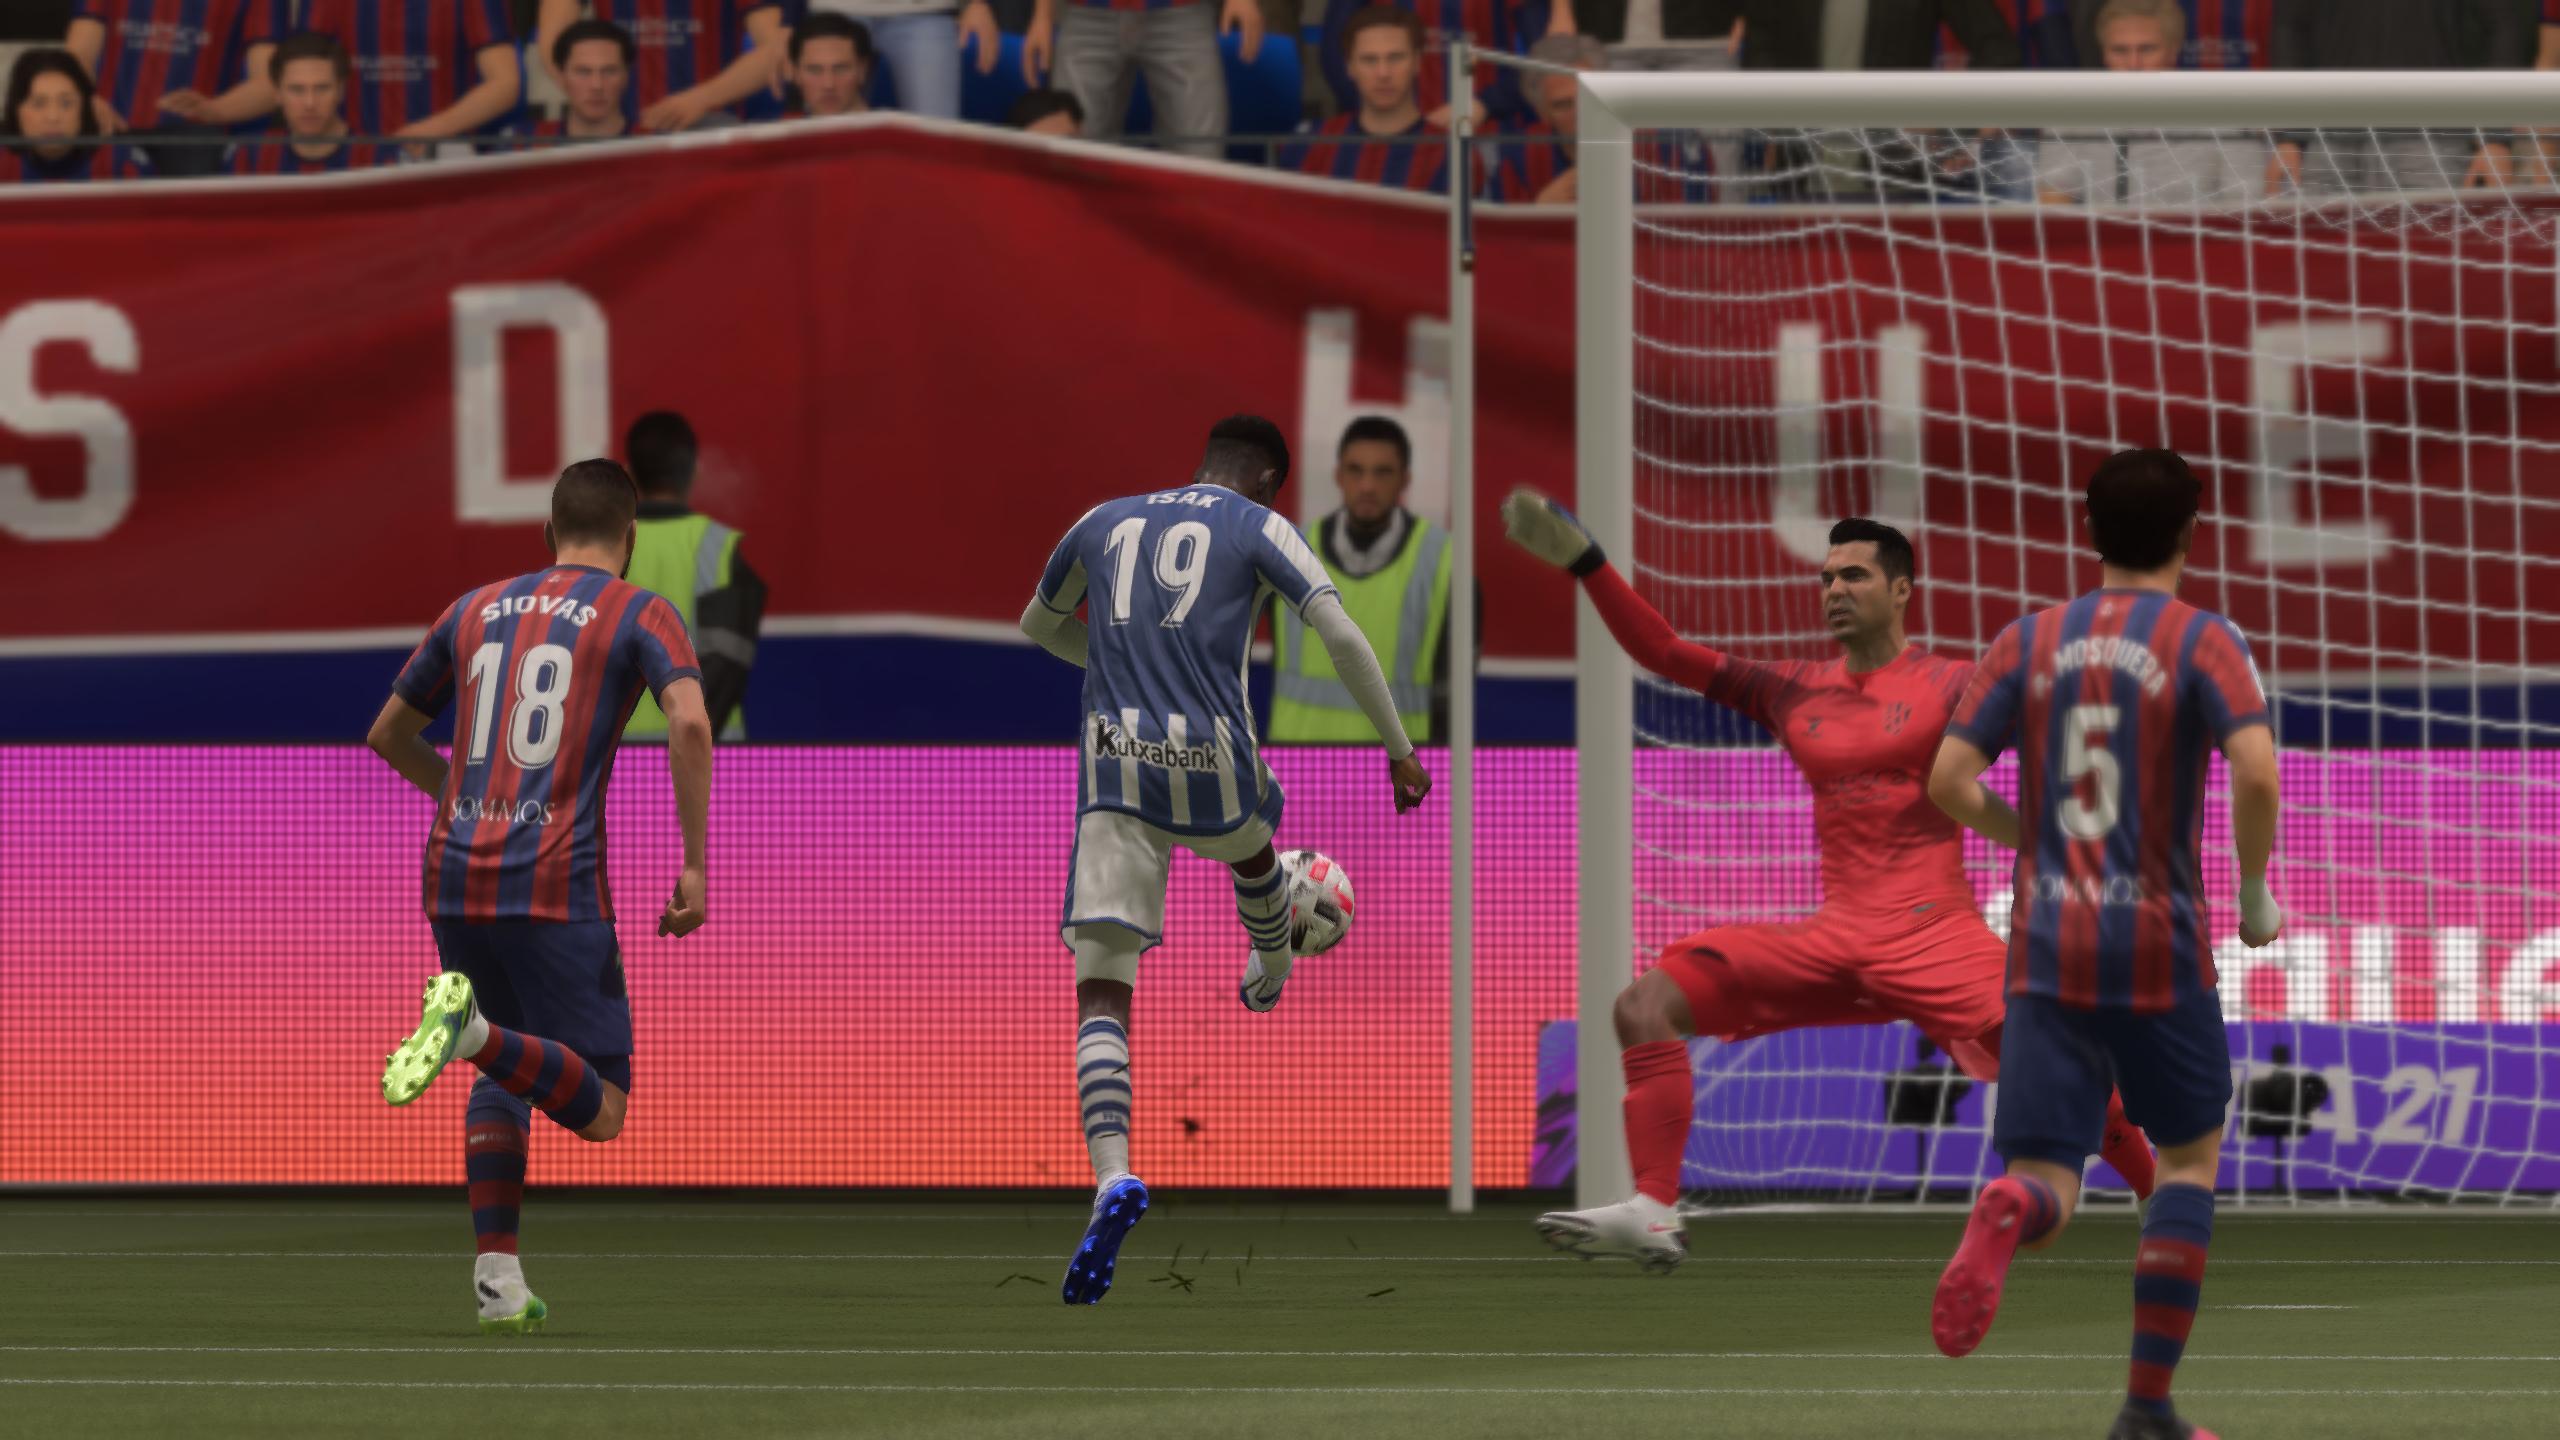 Fifa 21 Screenshot 2020.10.22 - 01.15.53.39